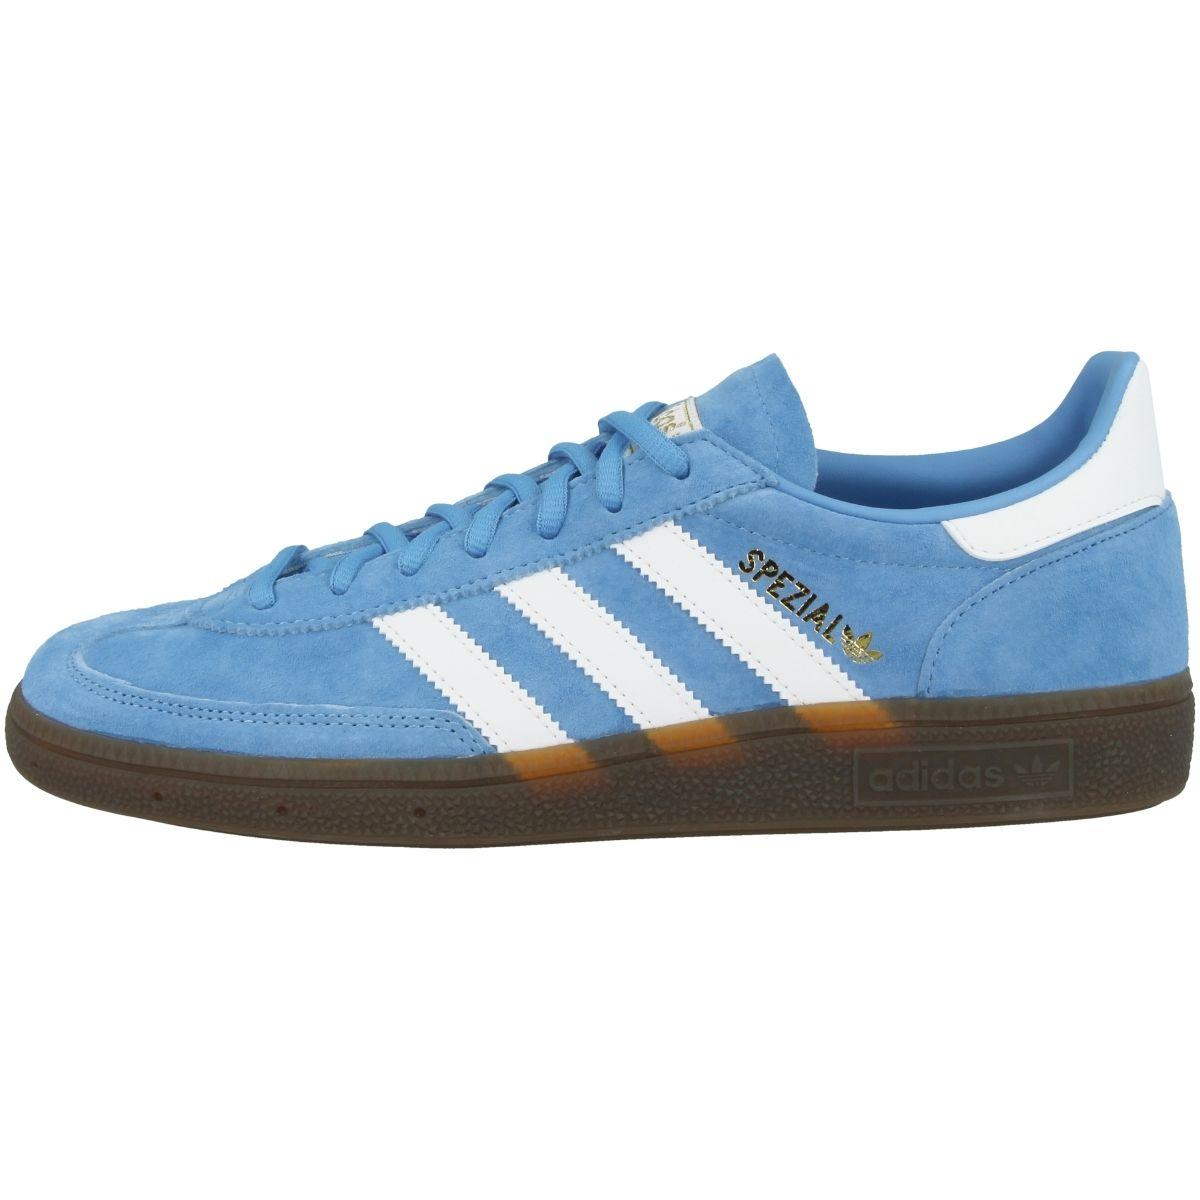 details for free shipping new product Adidas Handball Spezial Schuhe Original Retro Sneaker Indoor ...